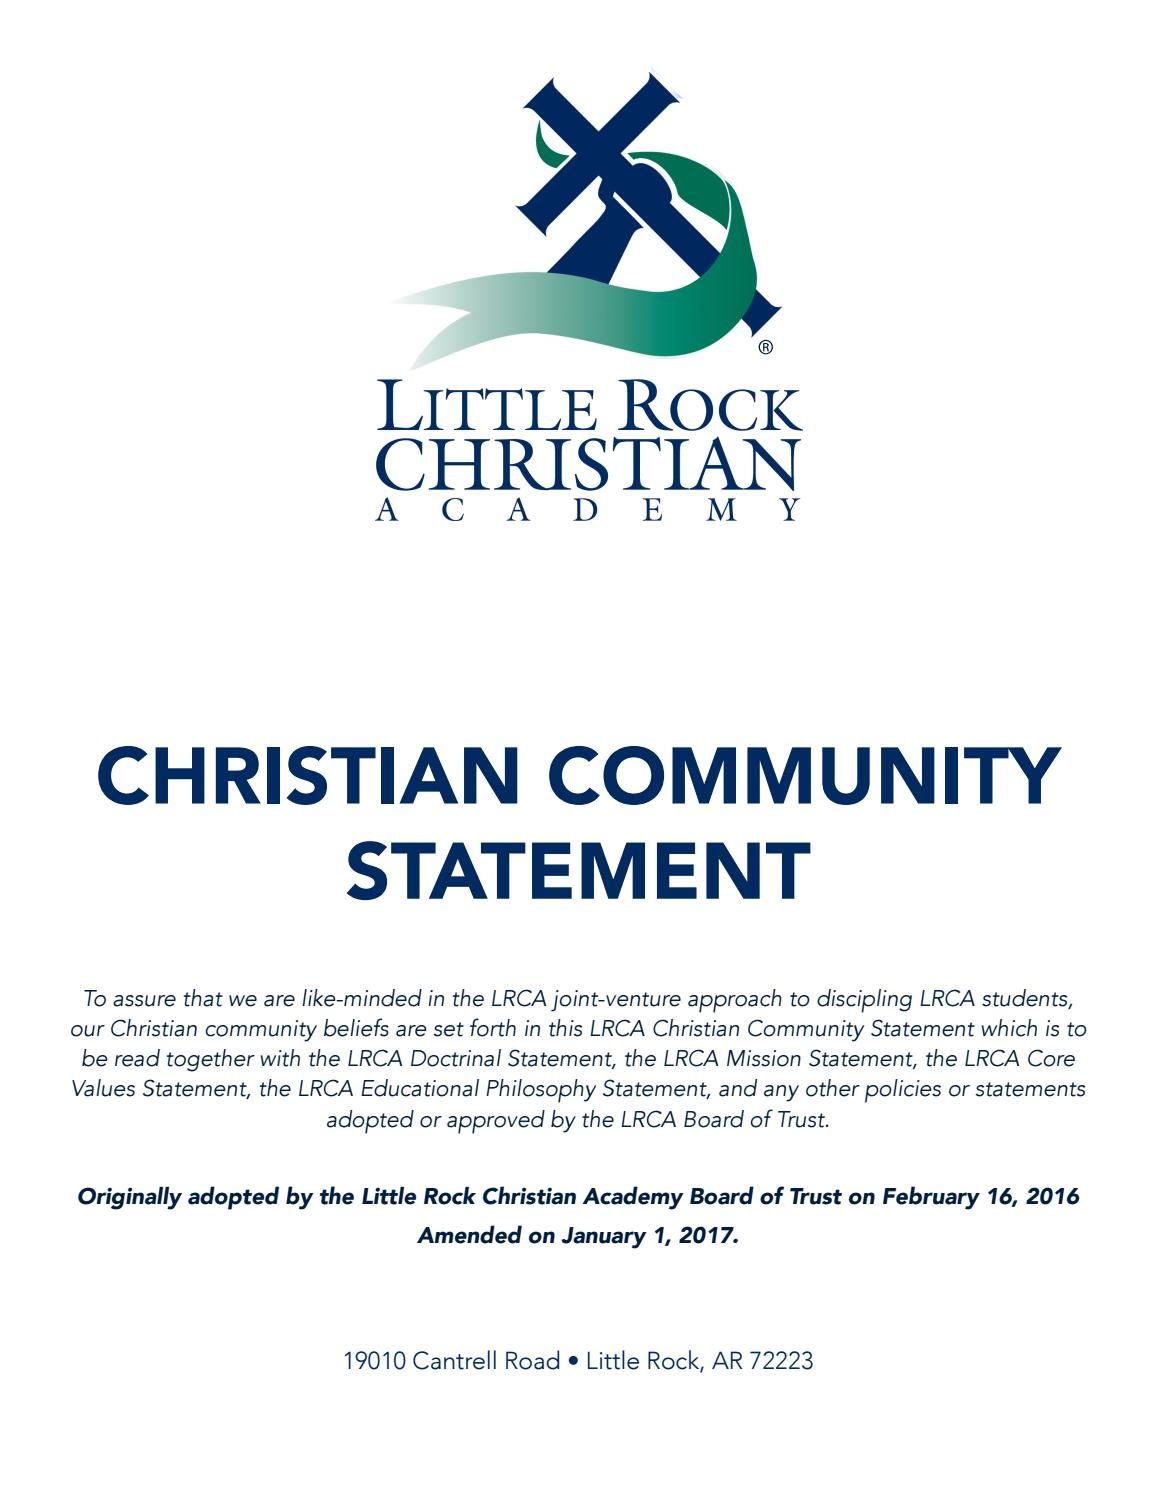 christian community statement little rock christian academy christian community statement 2 months ago lrca